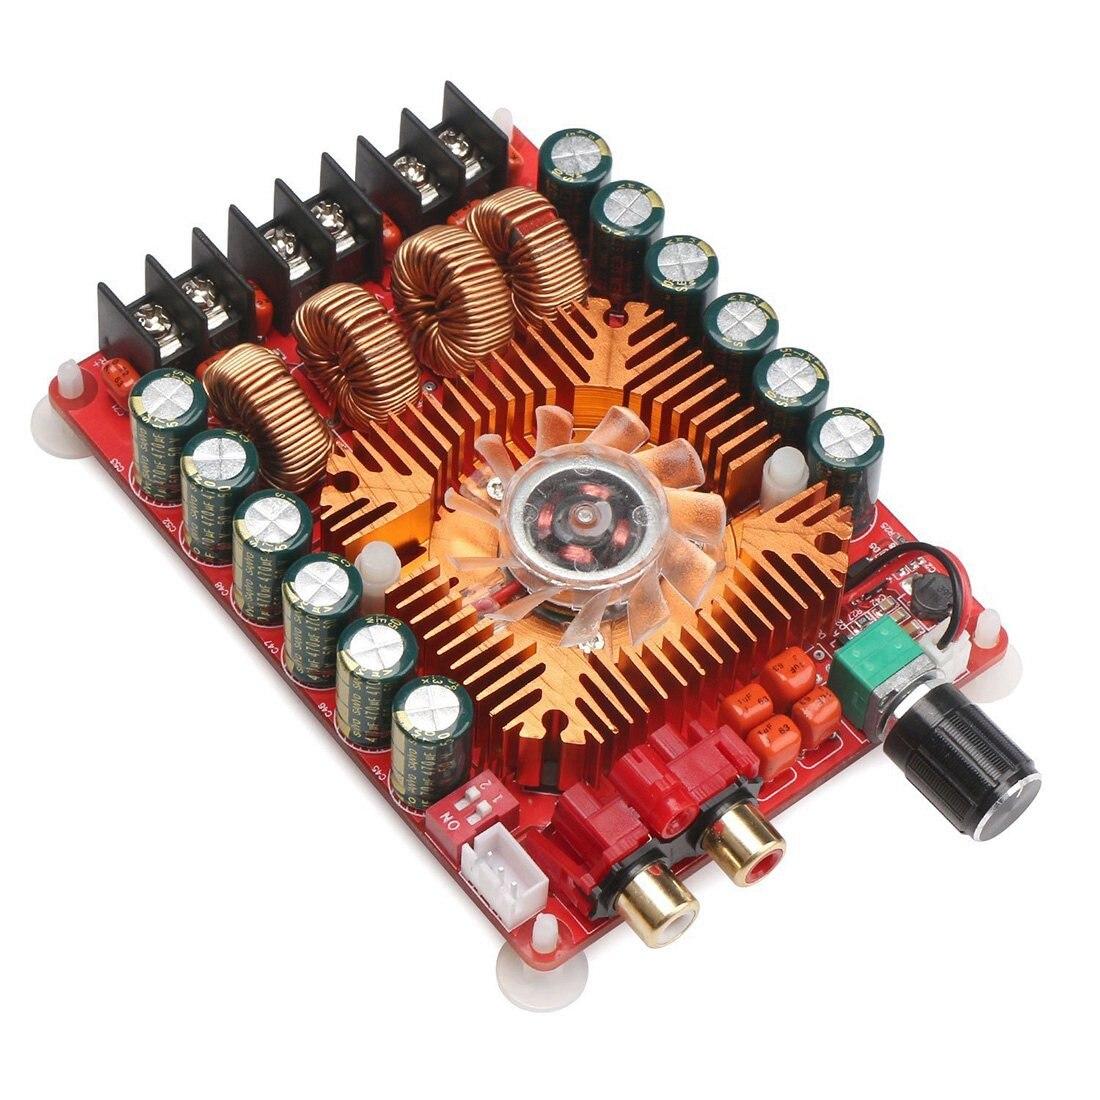 TDA7498E 2X160W Dual Channel Audio Amplifier Board Support BTL Mode 1X220W Single Channel for Car Vehicle